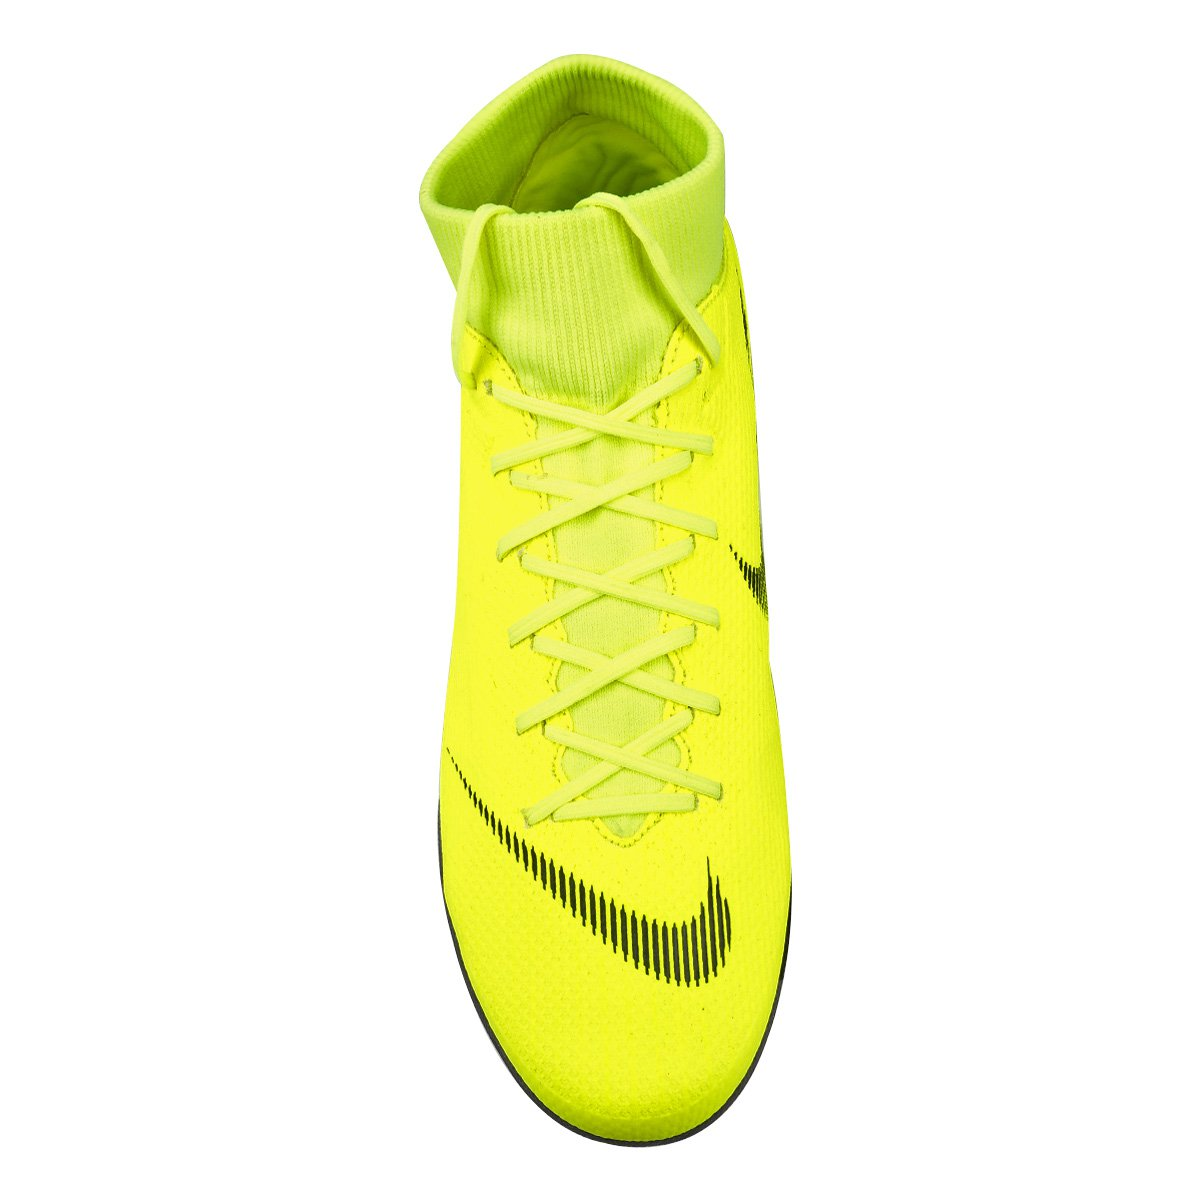 Chuteira Society Nike Mercurial Superfly 6 Academy - Amarelo e Preto ... 7cb10a25a7804